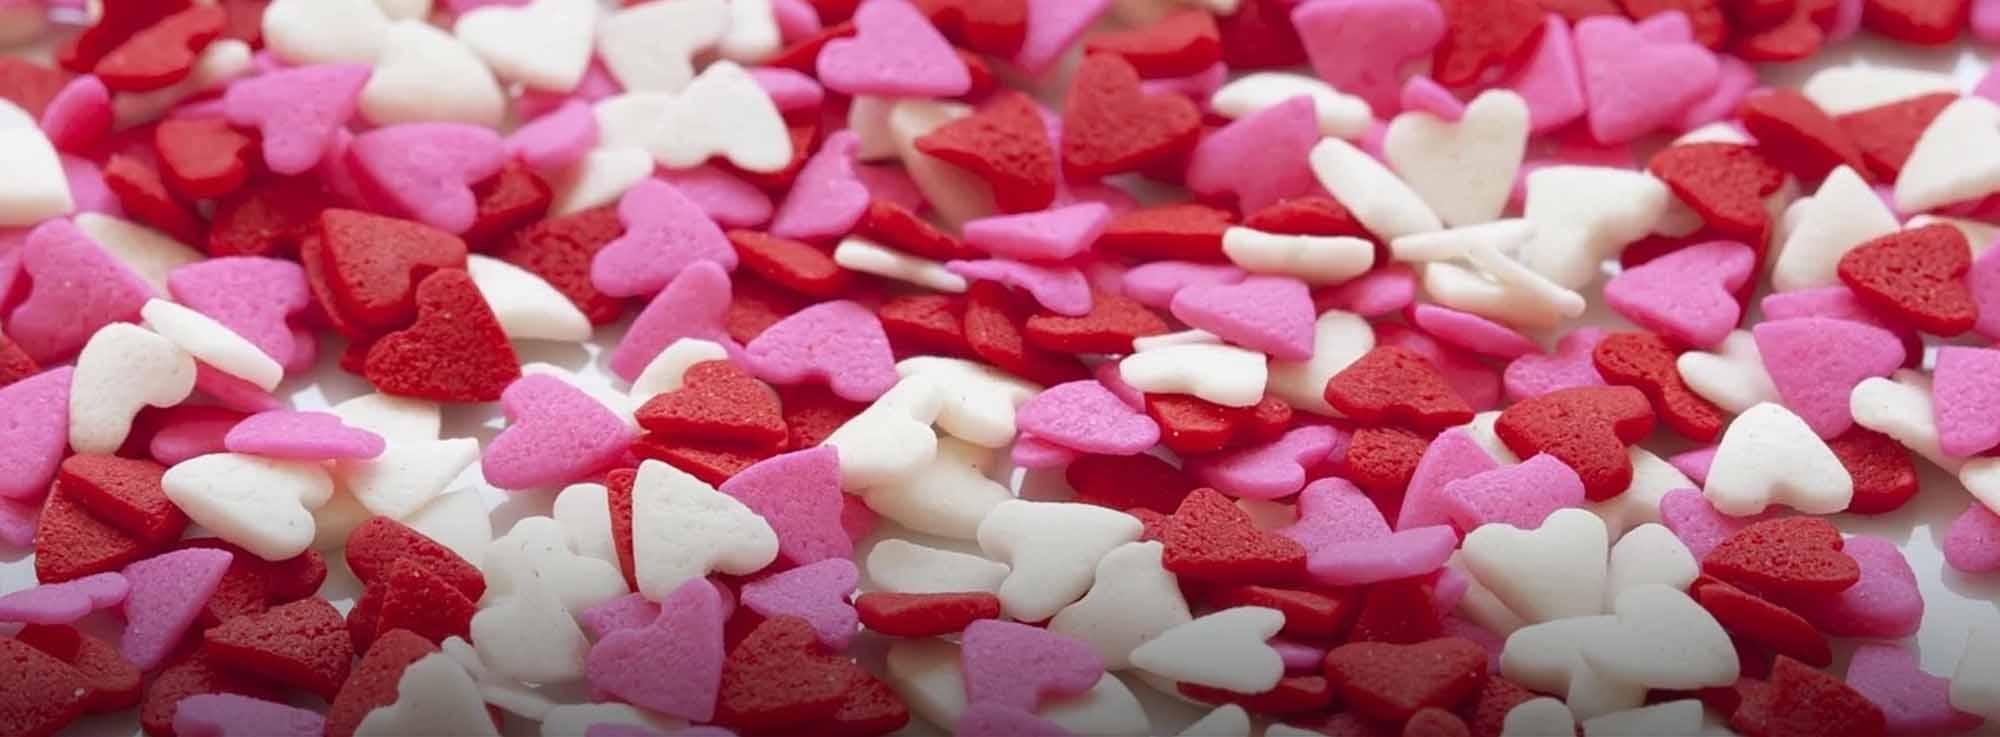 Bari: Bari canta l'amore